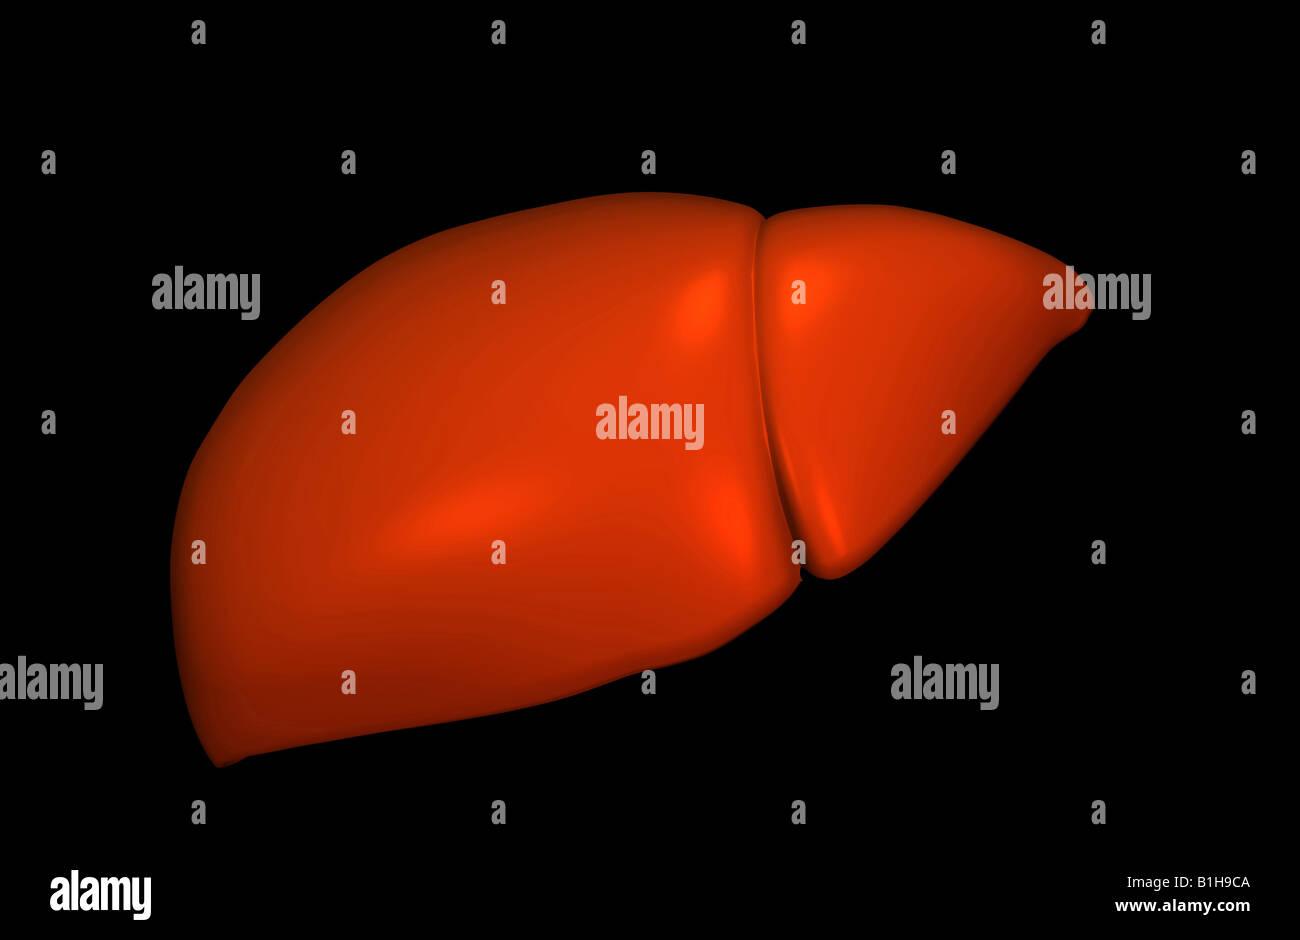 Anatomie Leber Stockfoto, Bild: 18205610 - Alamy